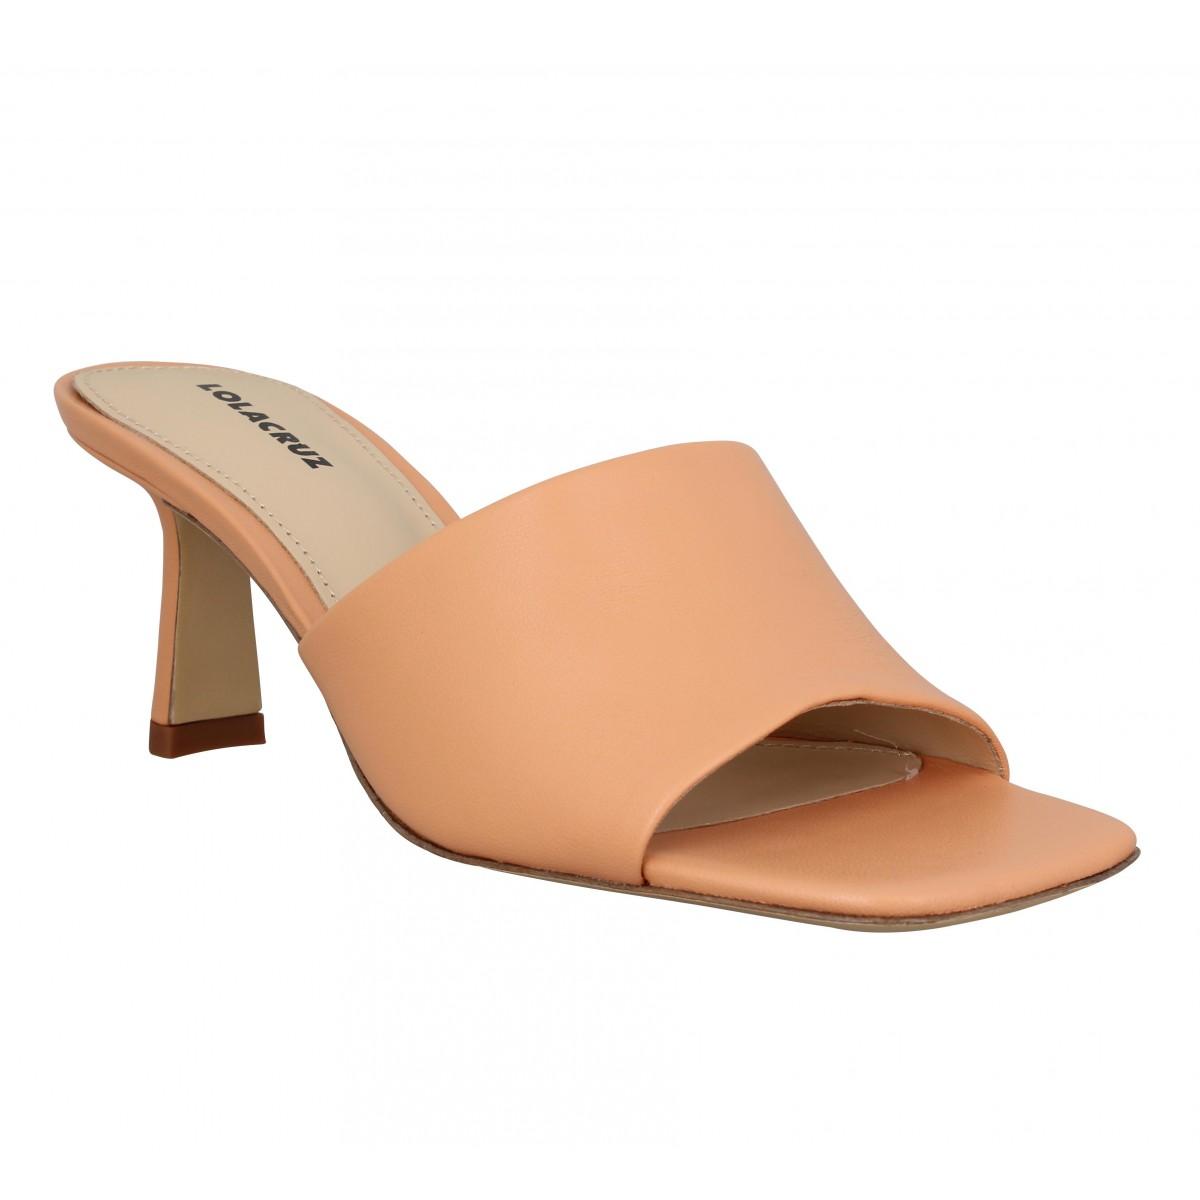 Mules LOLA CRUZ 124 cuir Femme Orange Pale